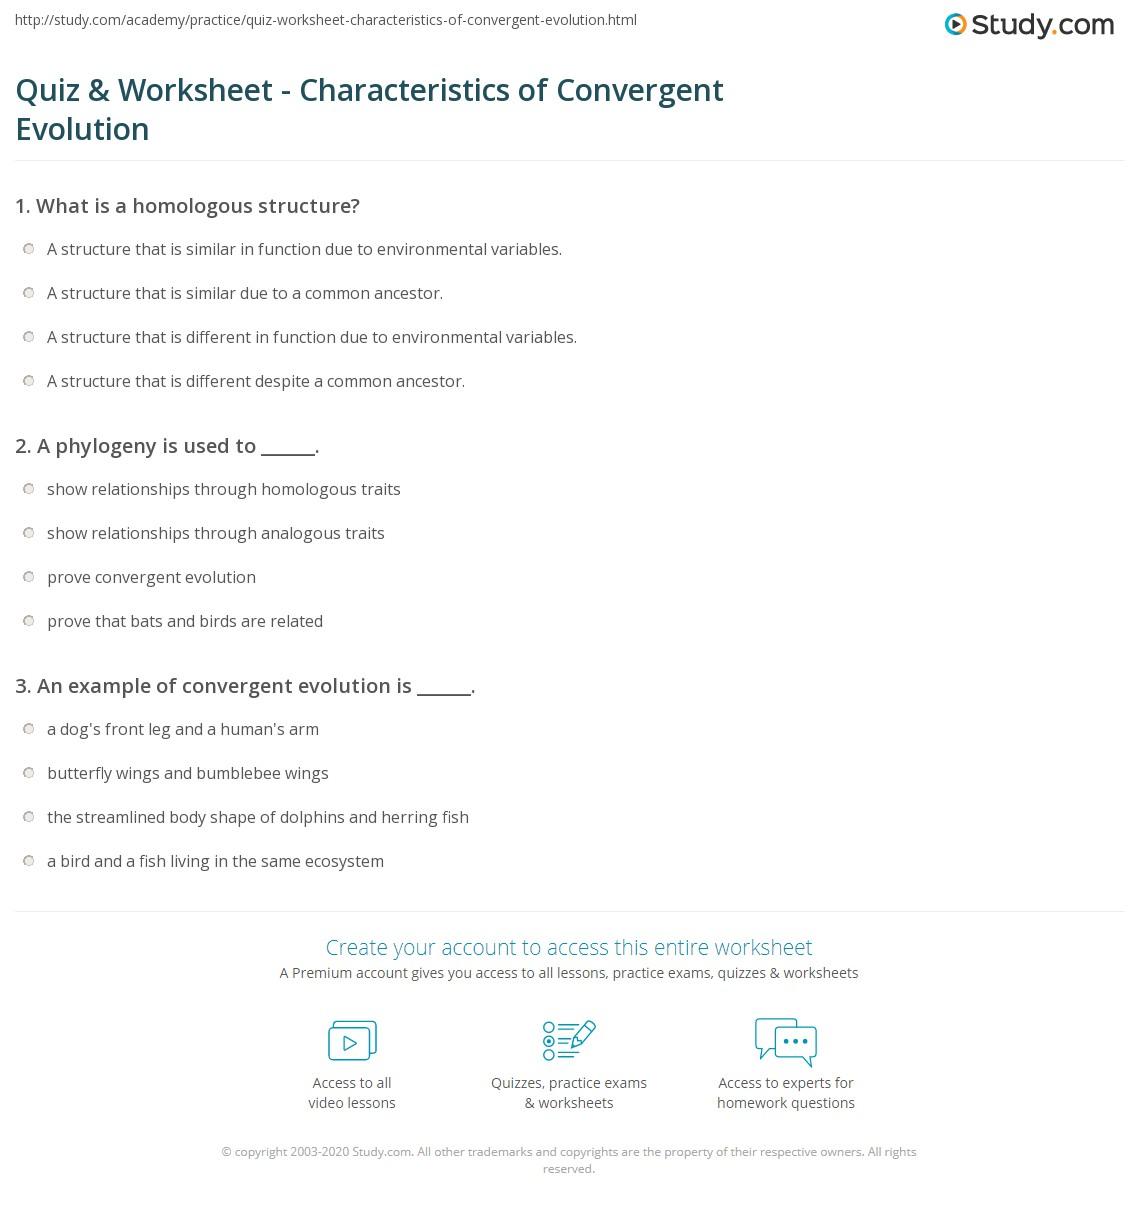 Uncategorized Homologous Structures Worksheet quiz worksheet characteristics of convergent evolution study com print examples definition worksheet